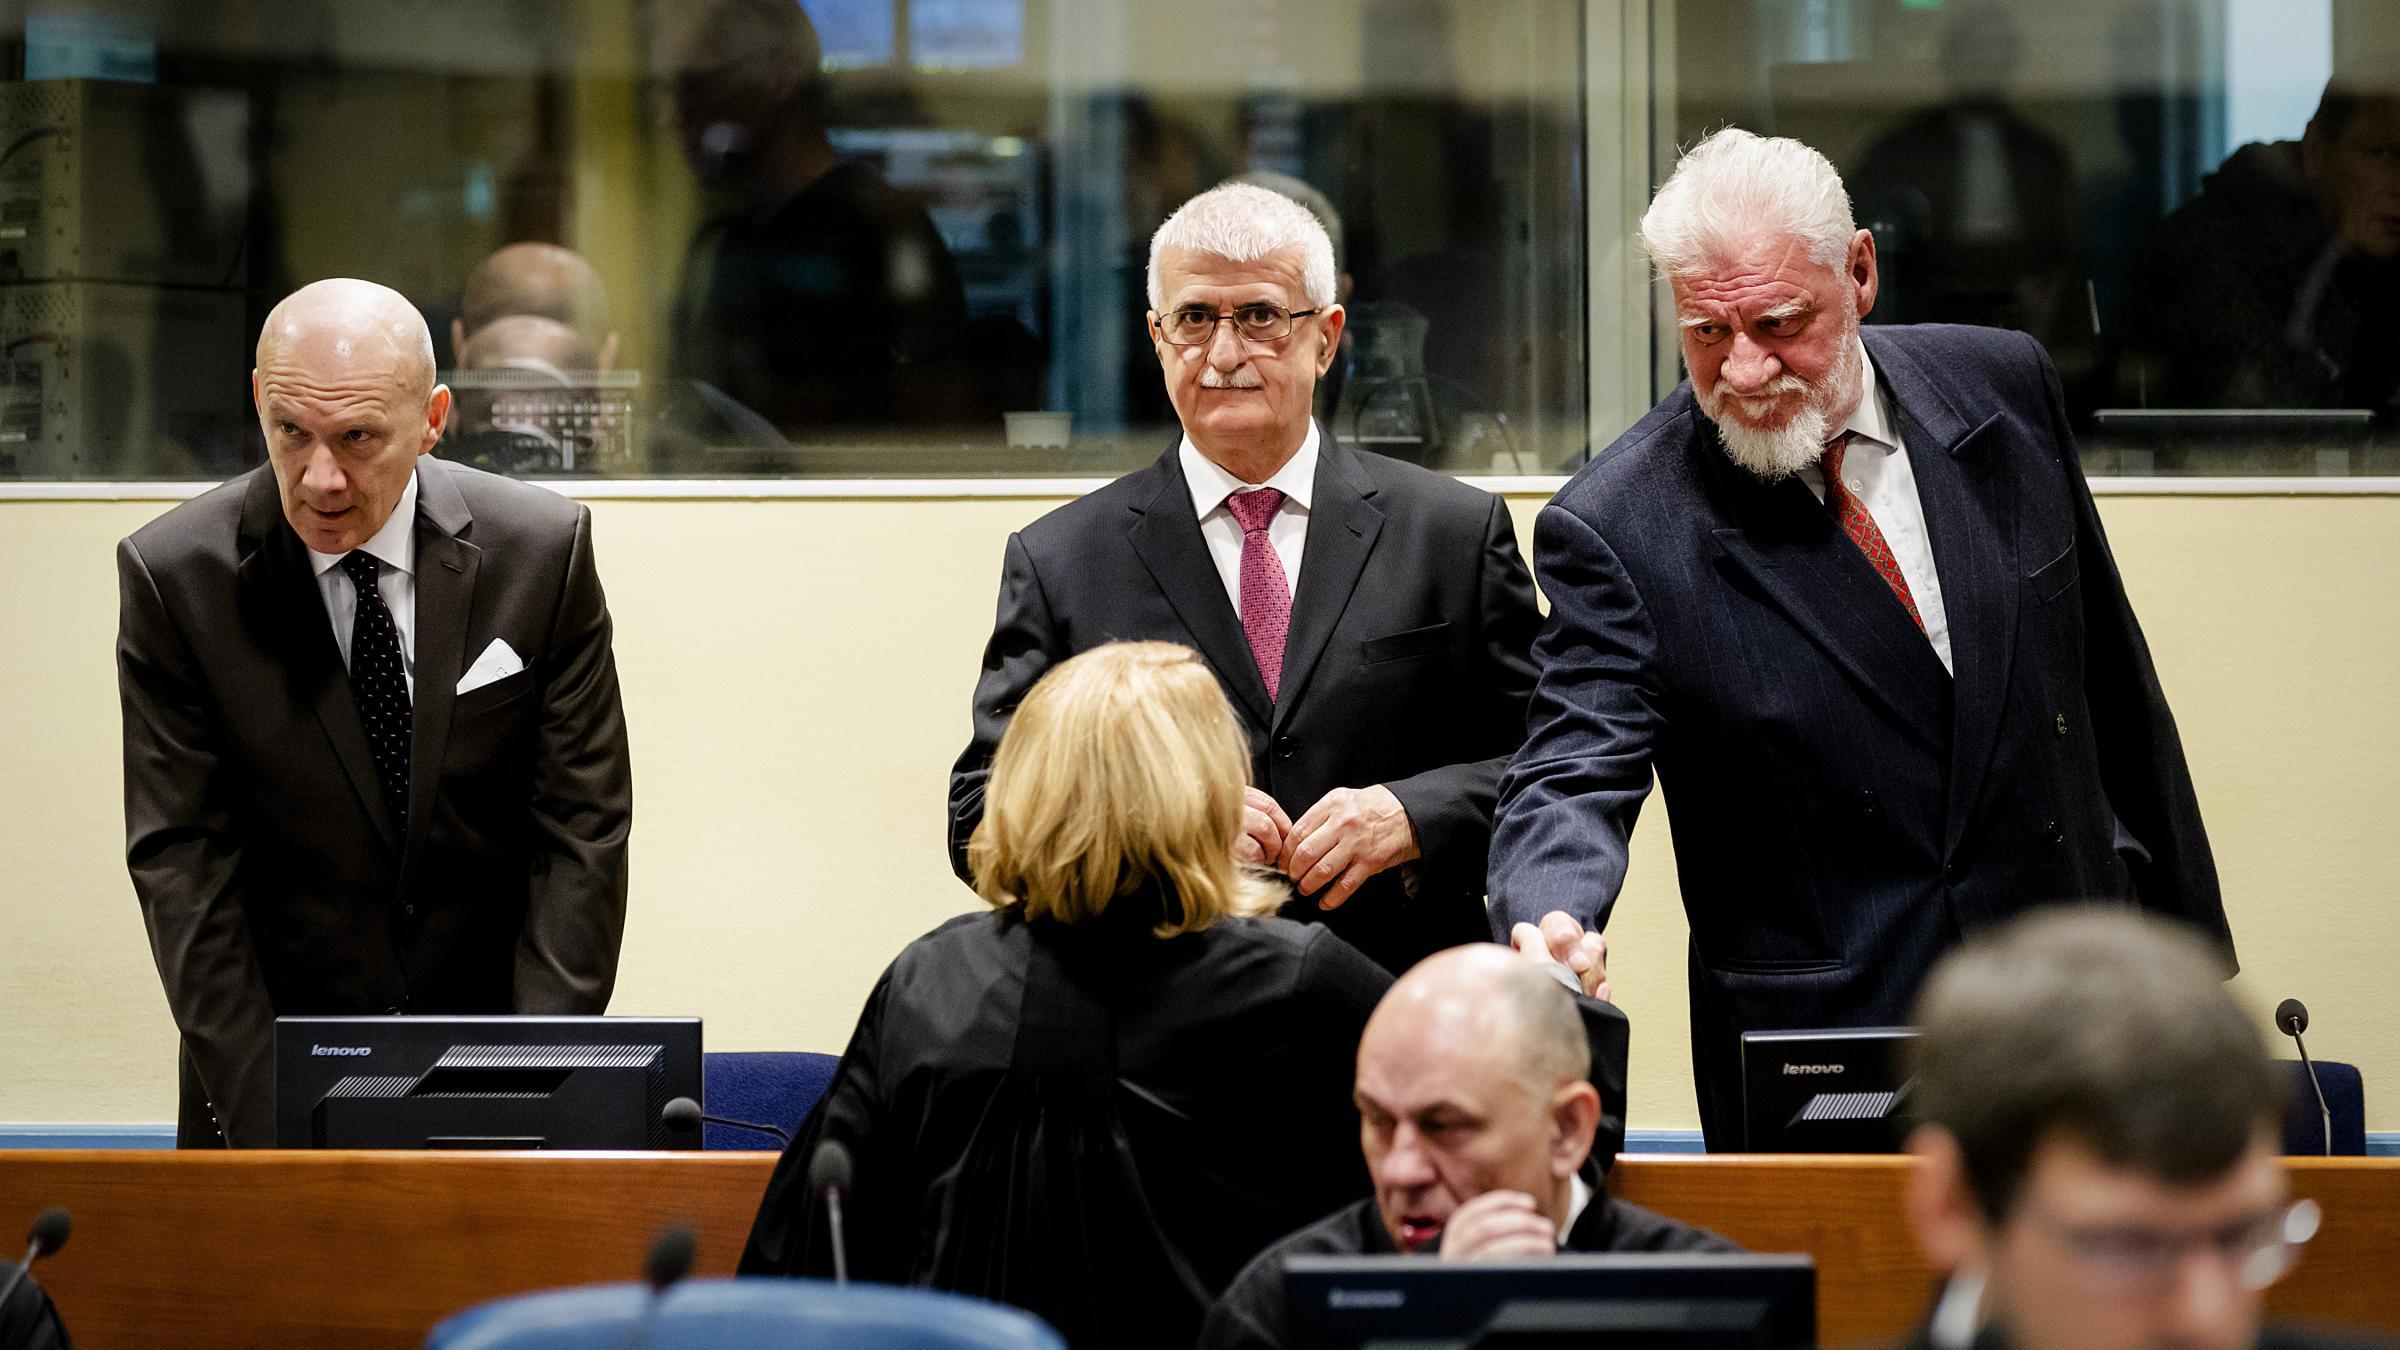 Jadranko Prlic Bruno Stojic and Slobodan Praljak from left enter the Yugoslav War Crimes Tribunal in The Hague Netherlands on Wednesday